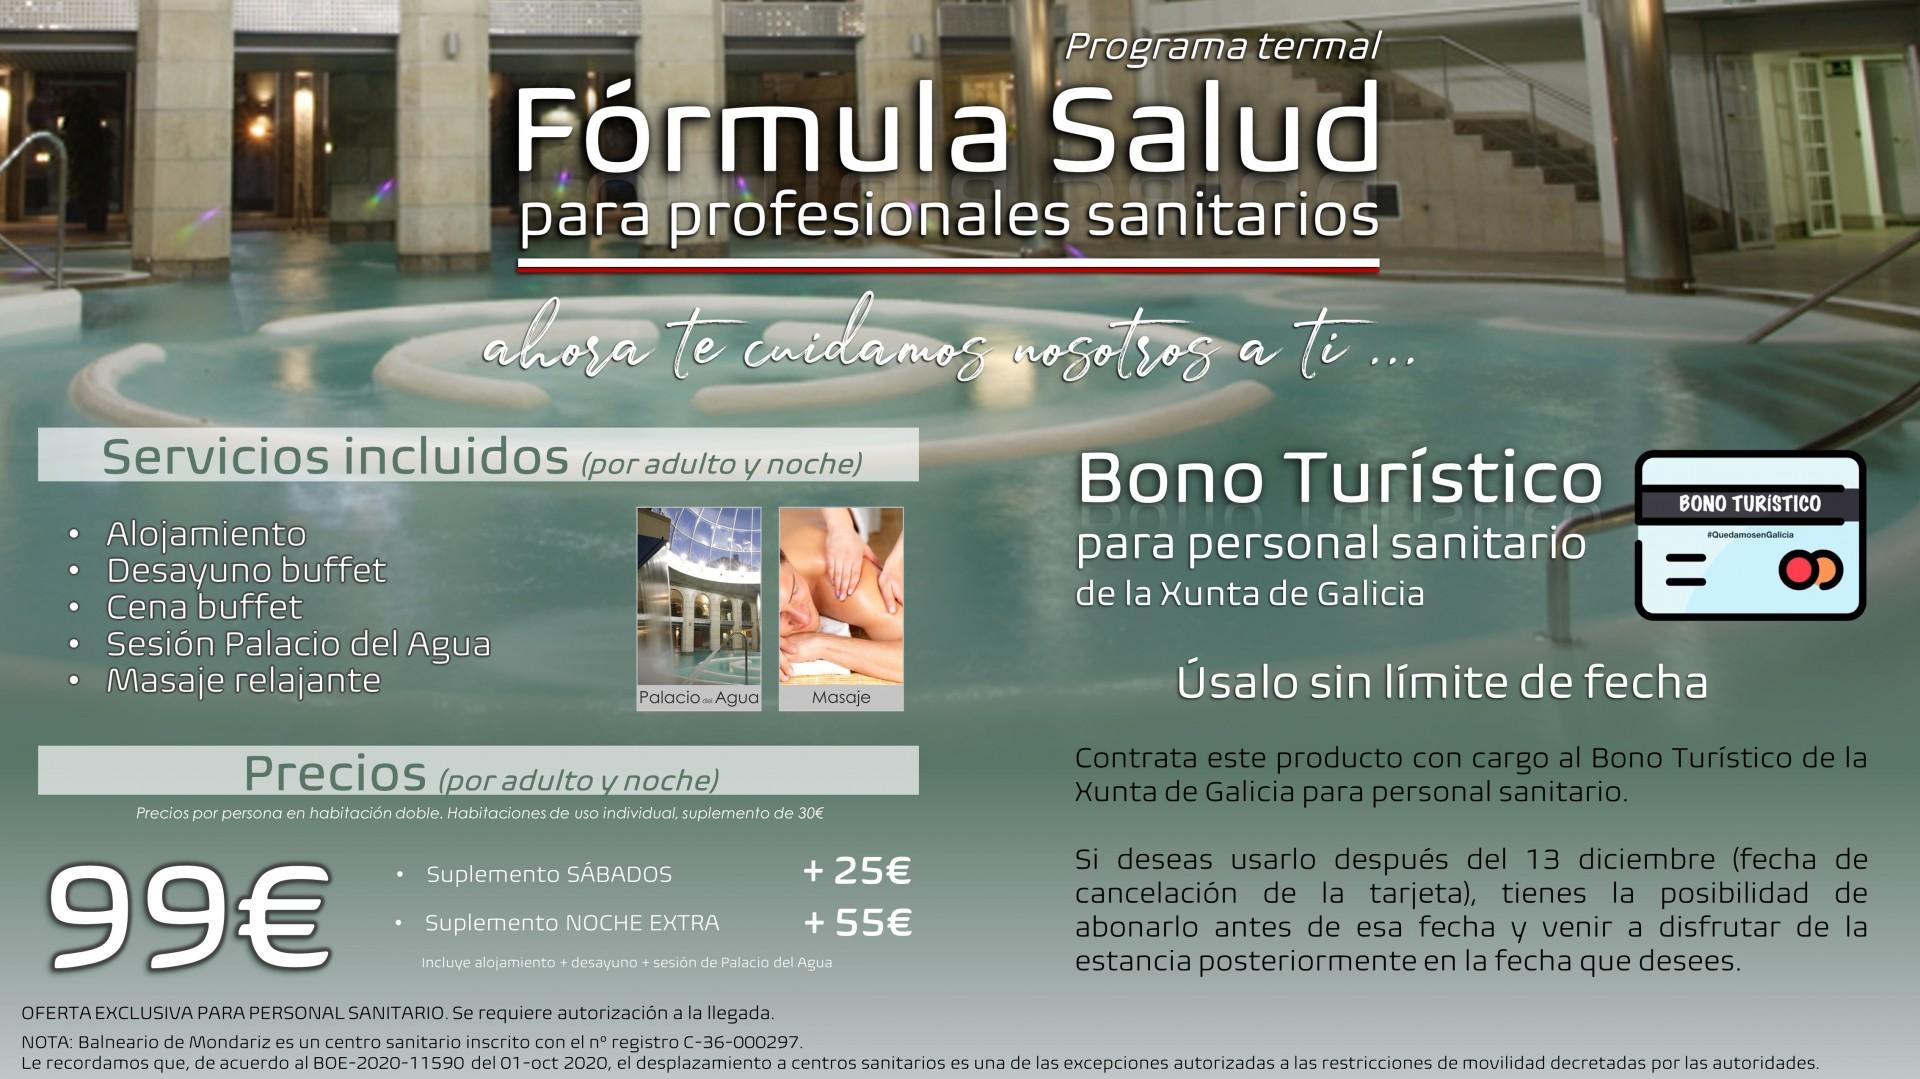 FÓRMULA SALUD · Programa Termal para profesionales sanitarios